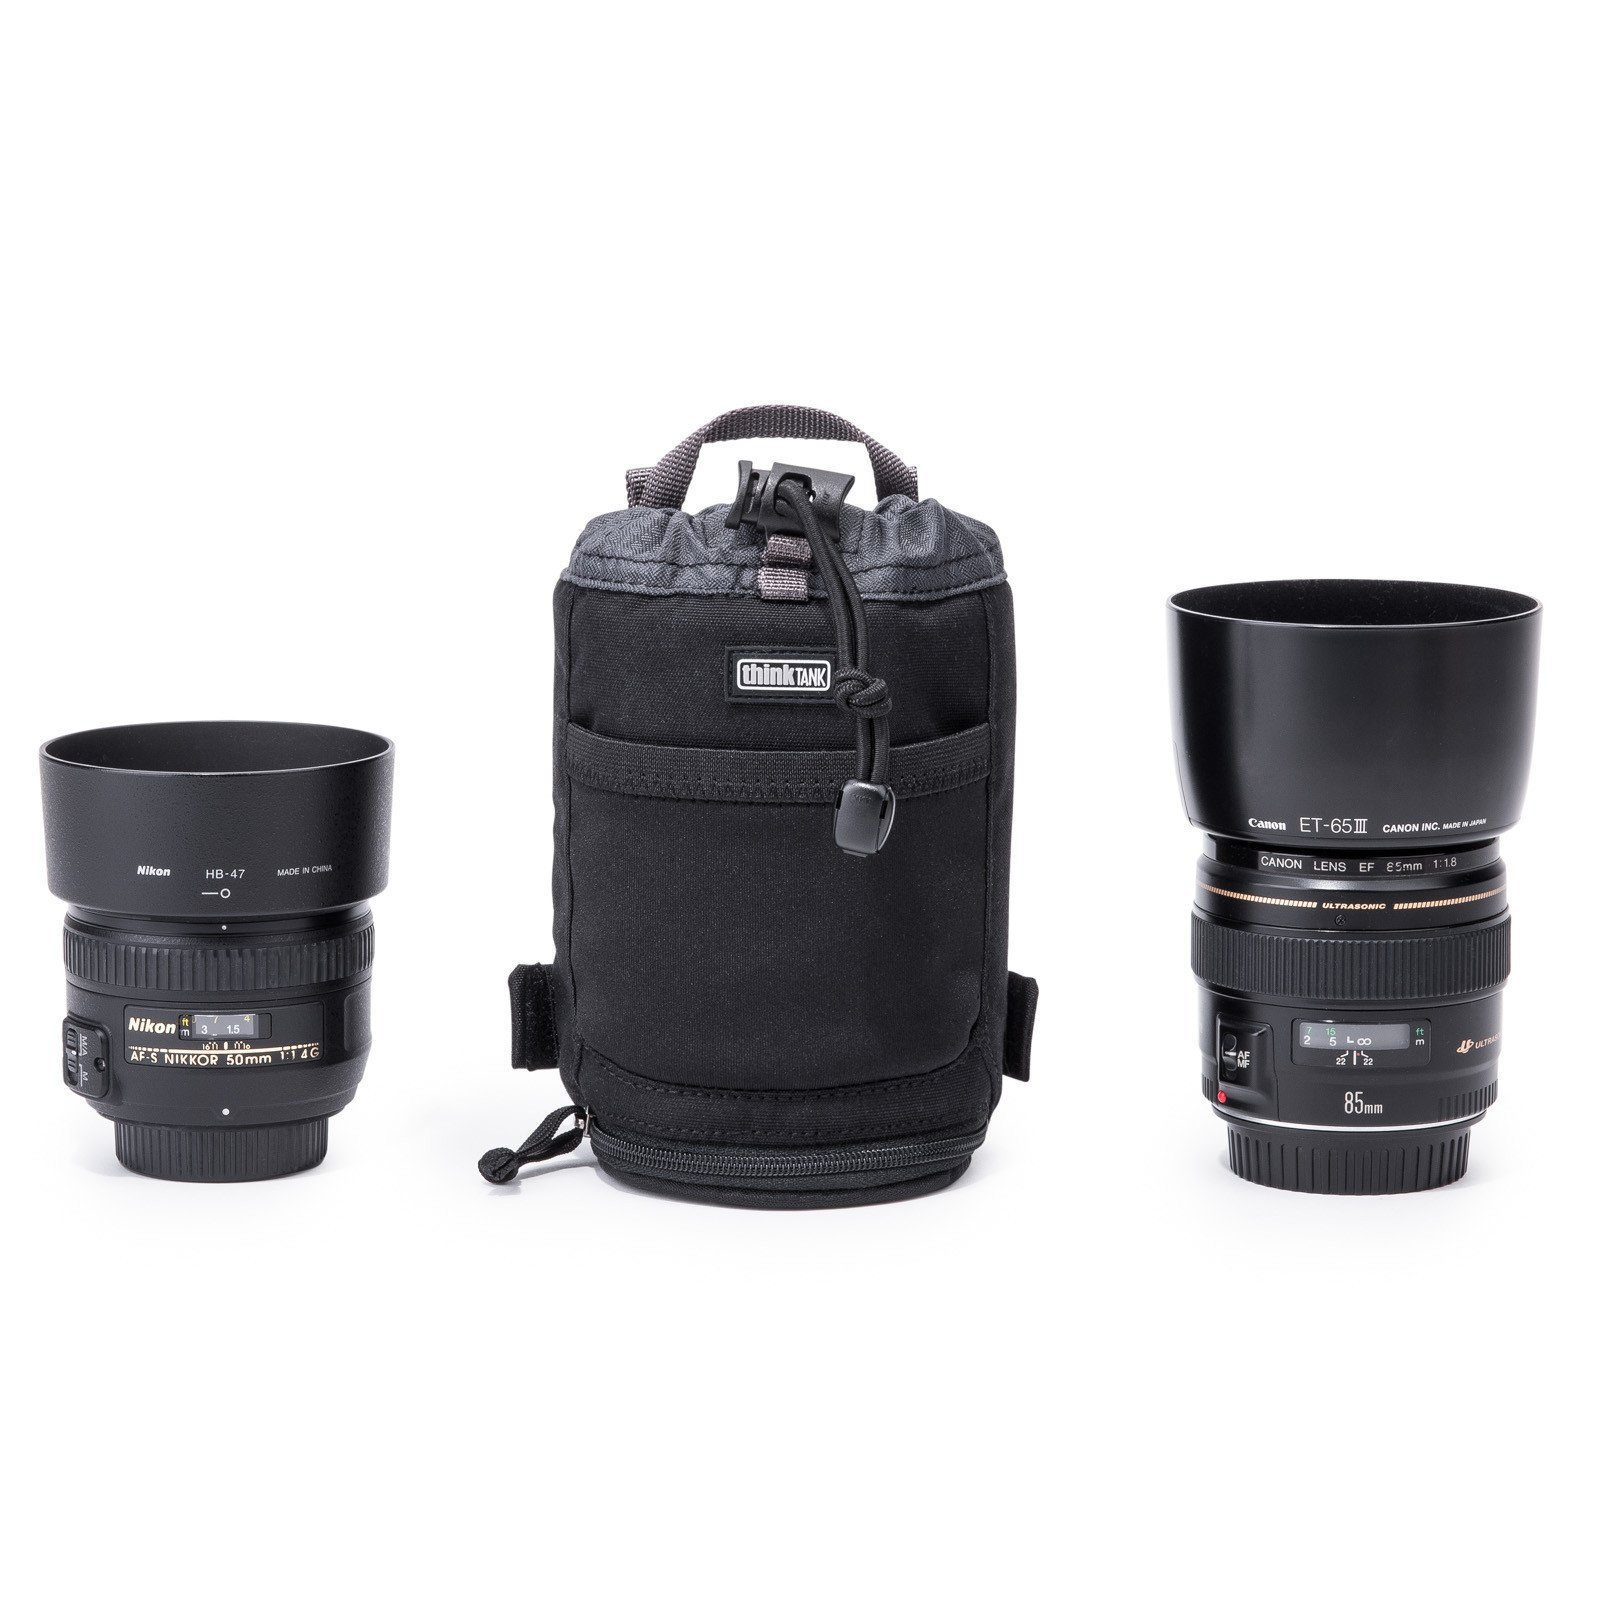 Think Tank Photo Lens Changer 15 V2.0 Lens Case (Black) by Think Tank